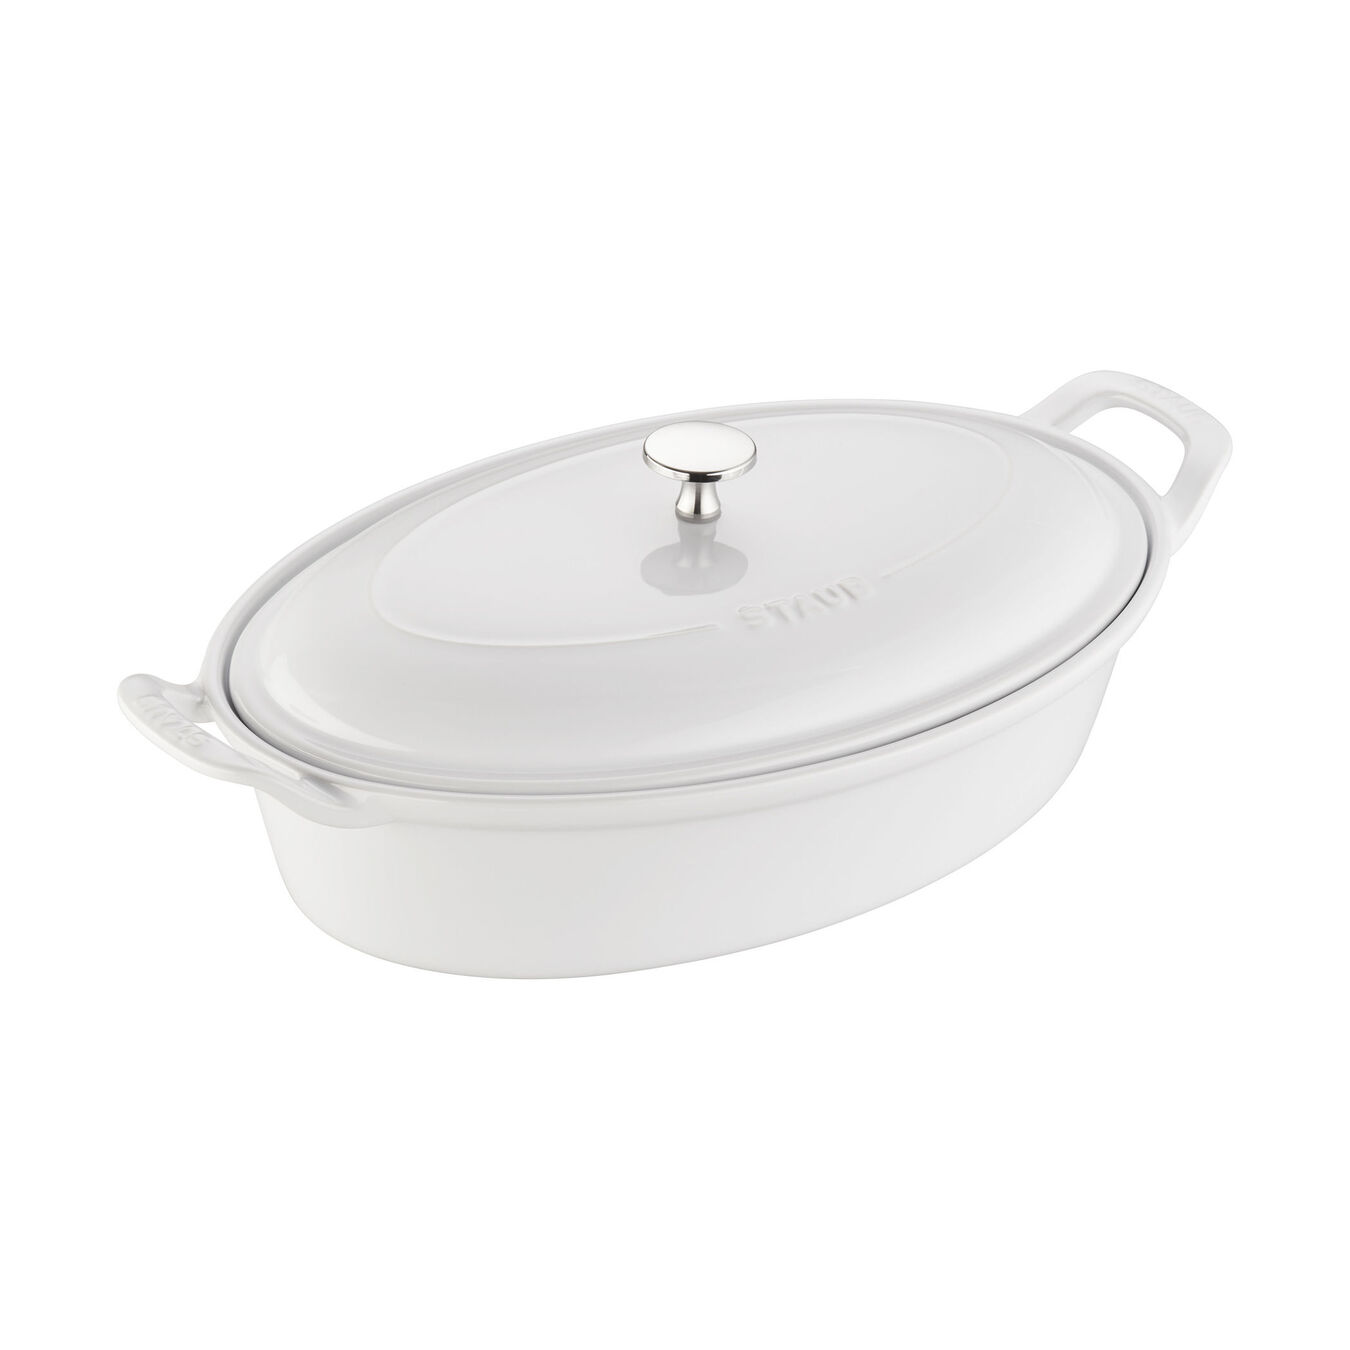 Ceramic Special shape bakeware, white,,large 1